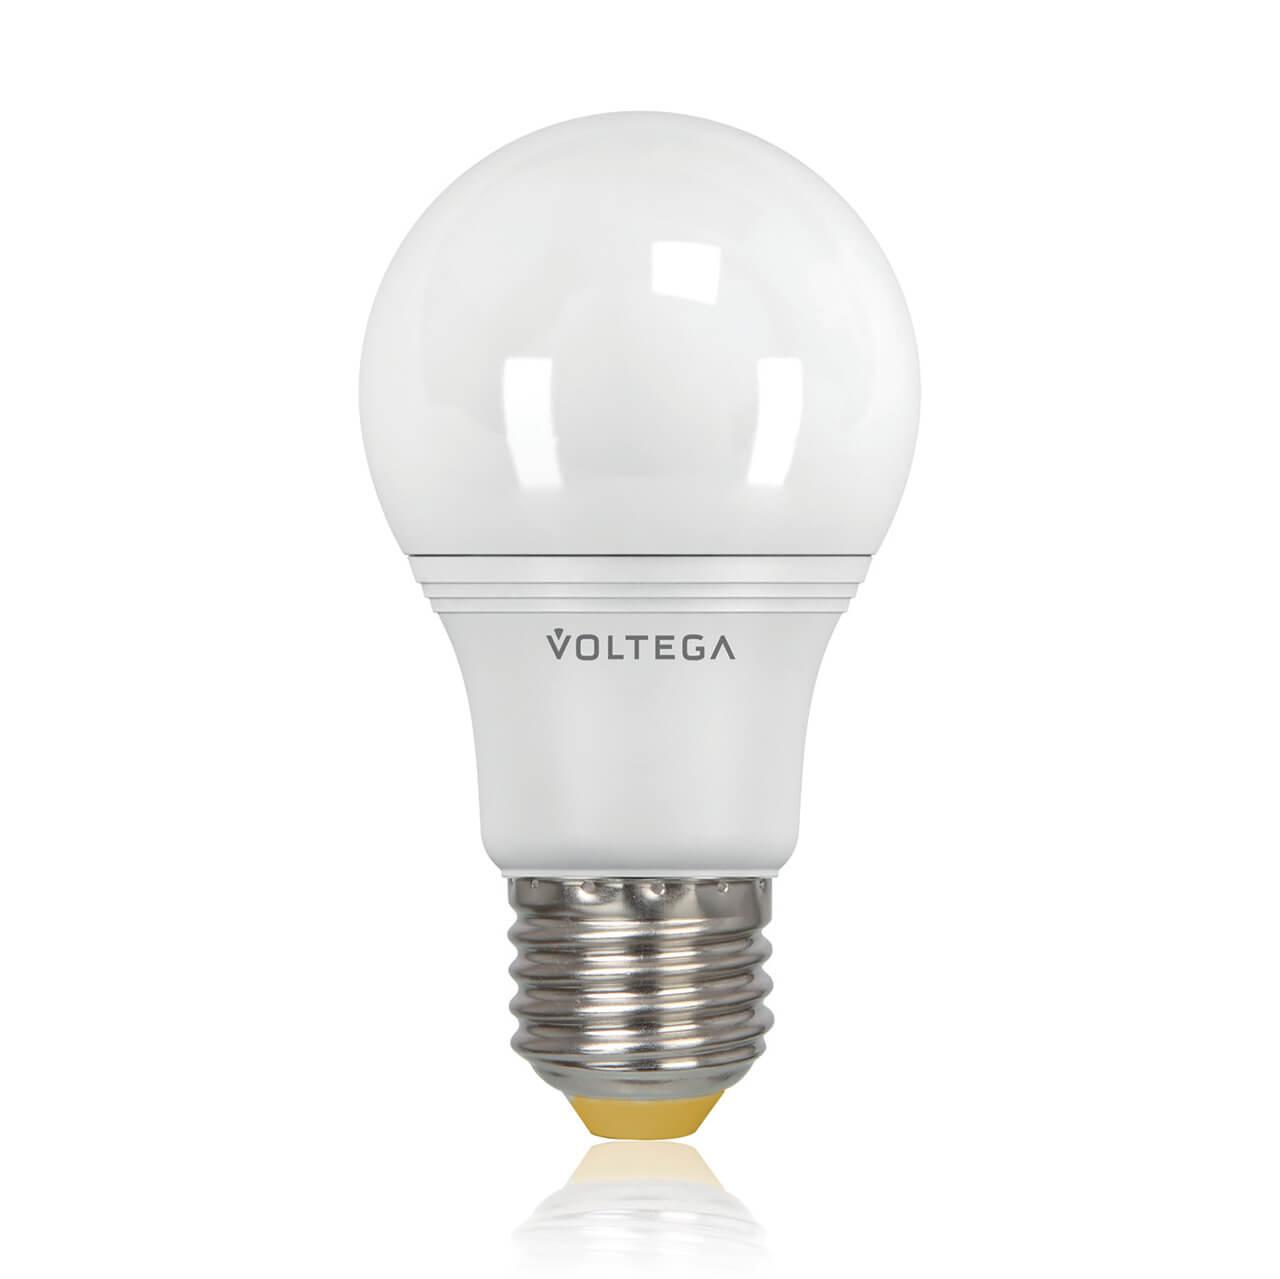 Лампа светодиодная Voltega E27 8W 4000К шар матовый VG2-A2E27cold8W 5736 voltega лампа светодиодная voltega рефлектор матовый e14 5 4w 4000к vg4 rm2e14cold5w 5756